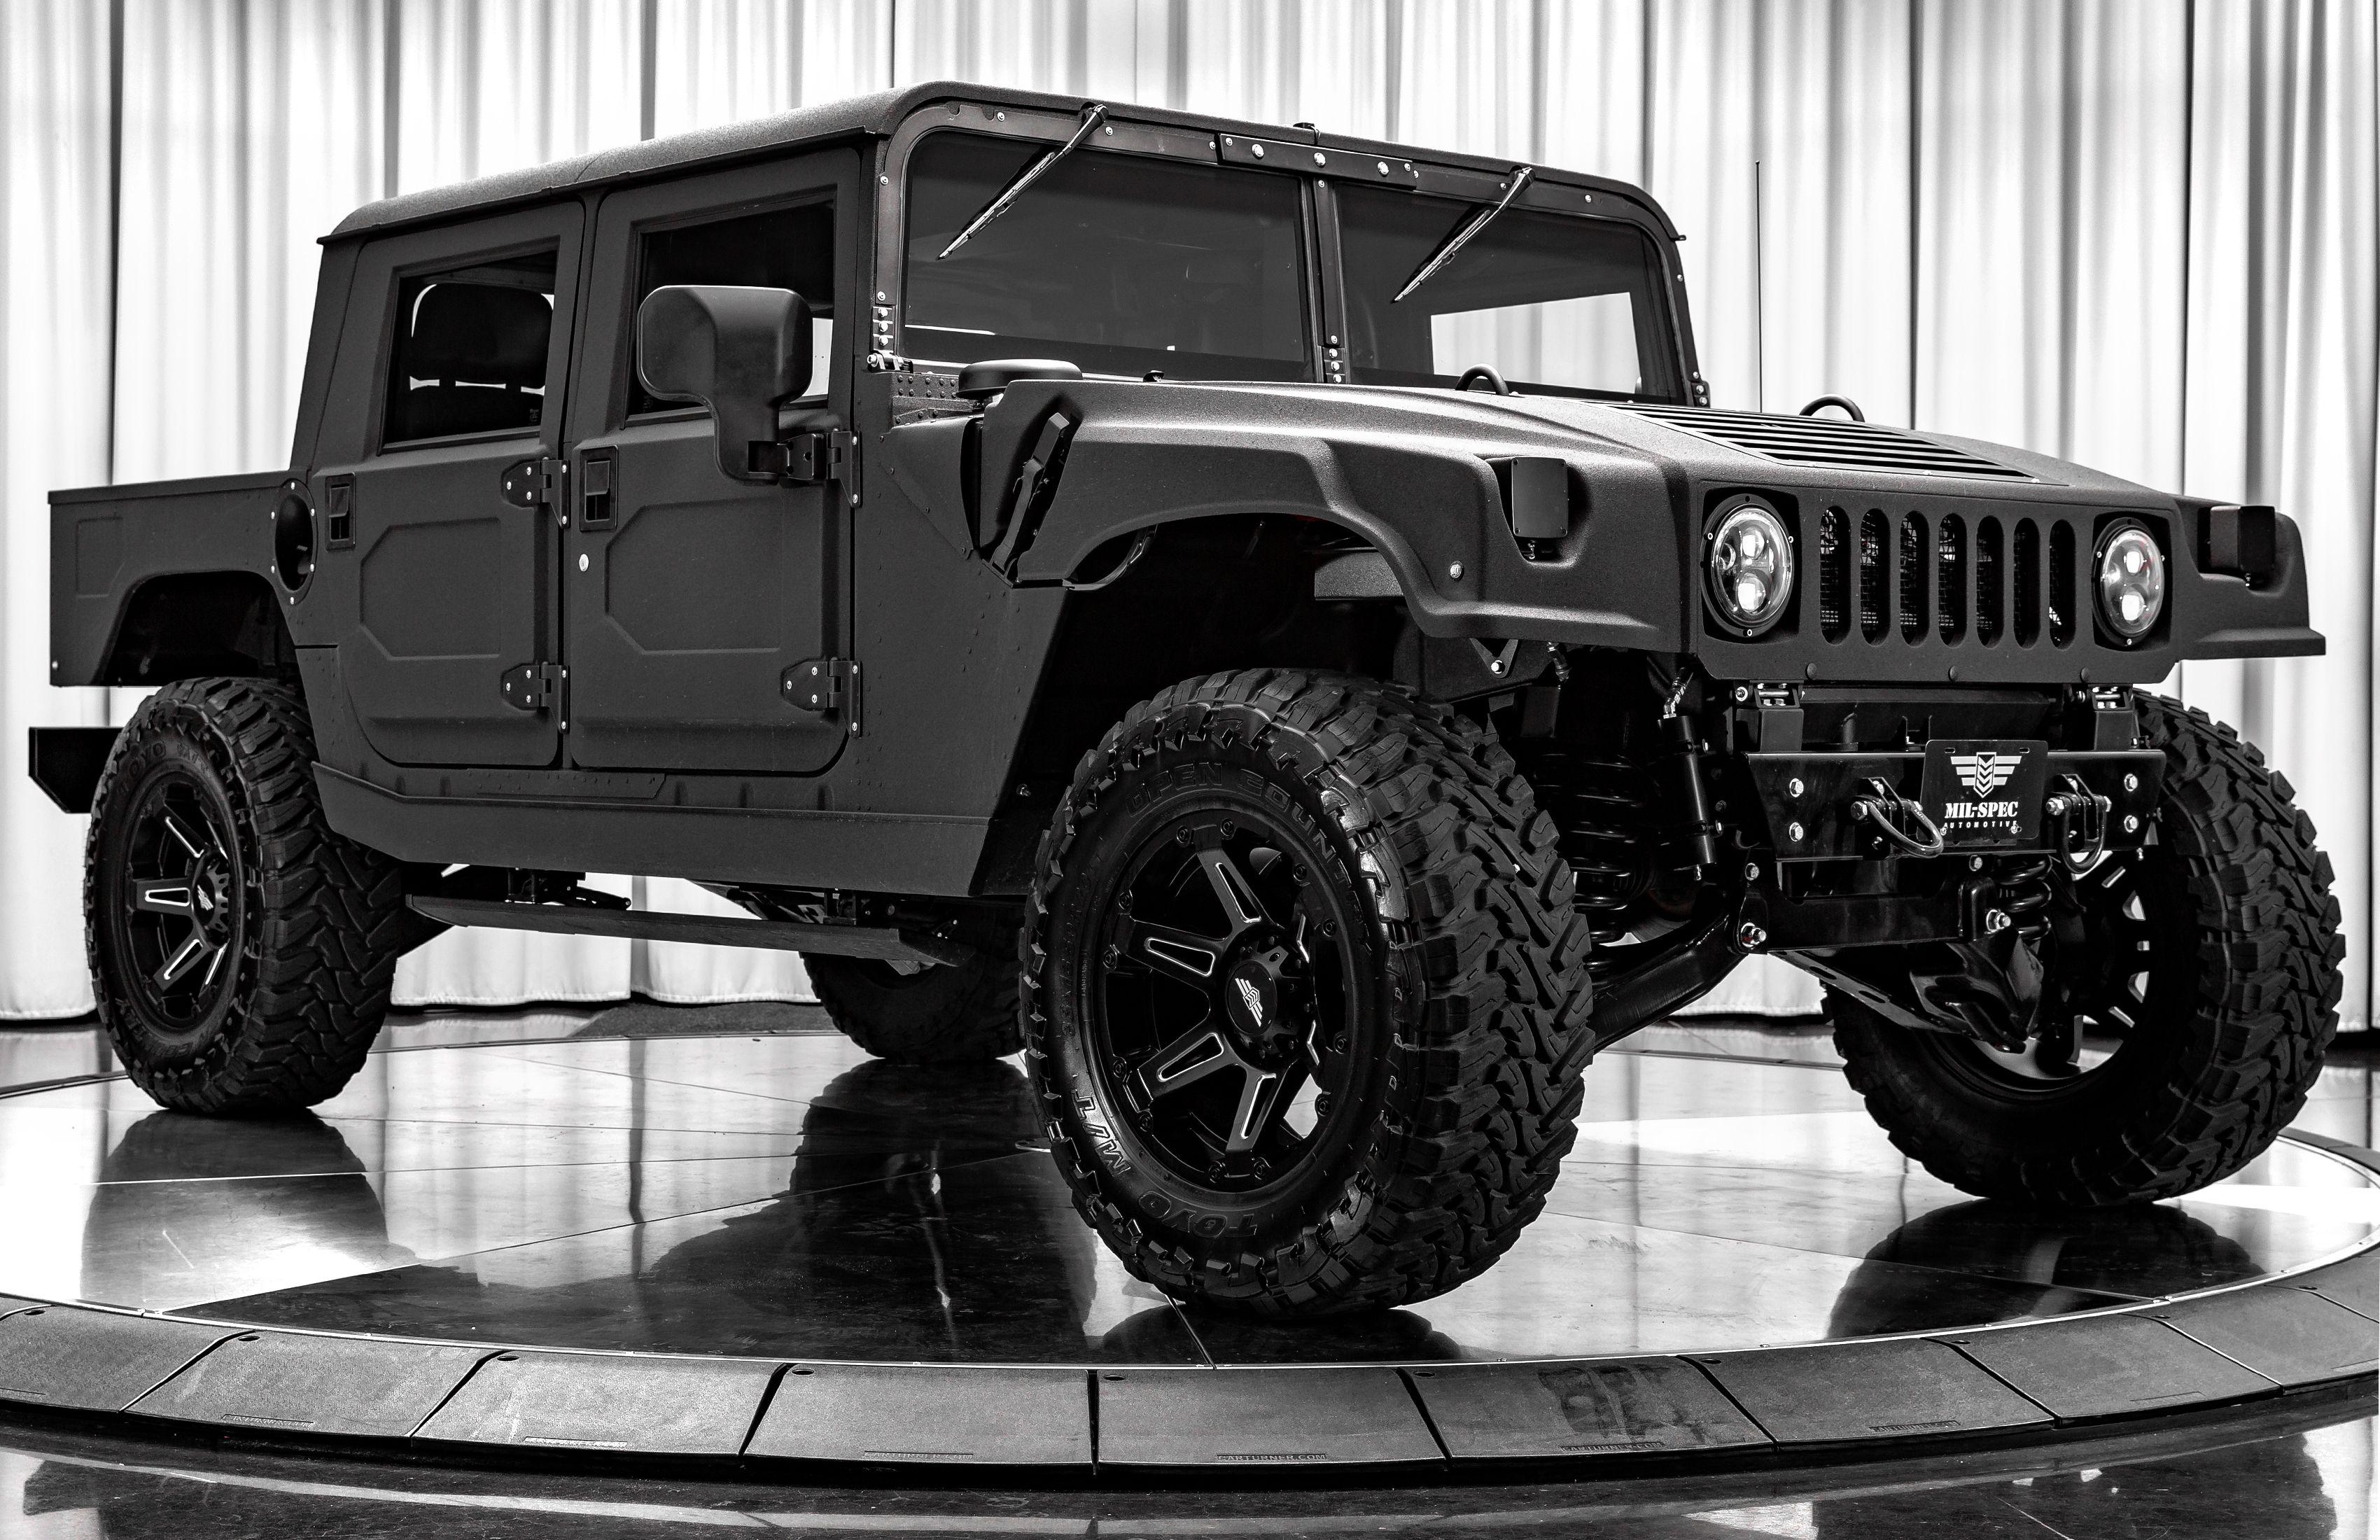 Mil-Spec-Hummer-H1-pickup-hardtot-launch-edition-2019-7